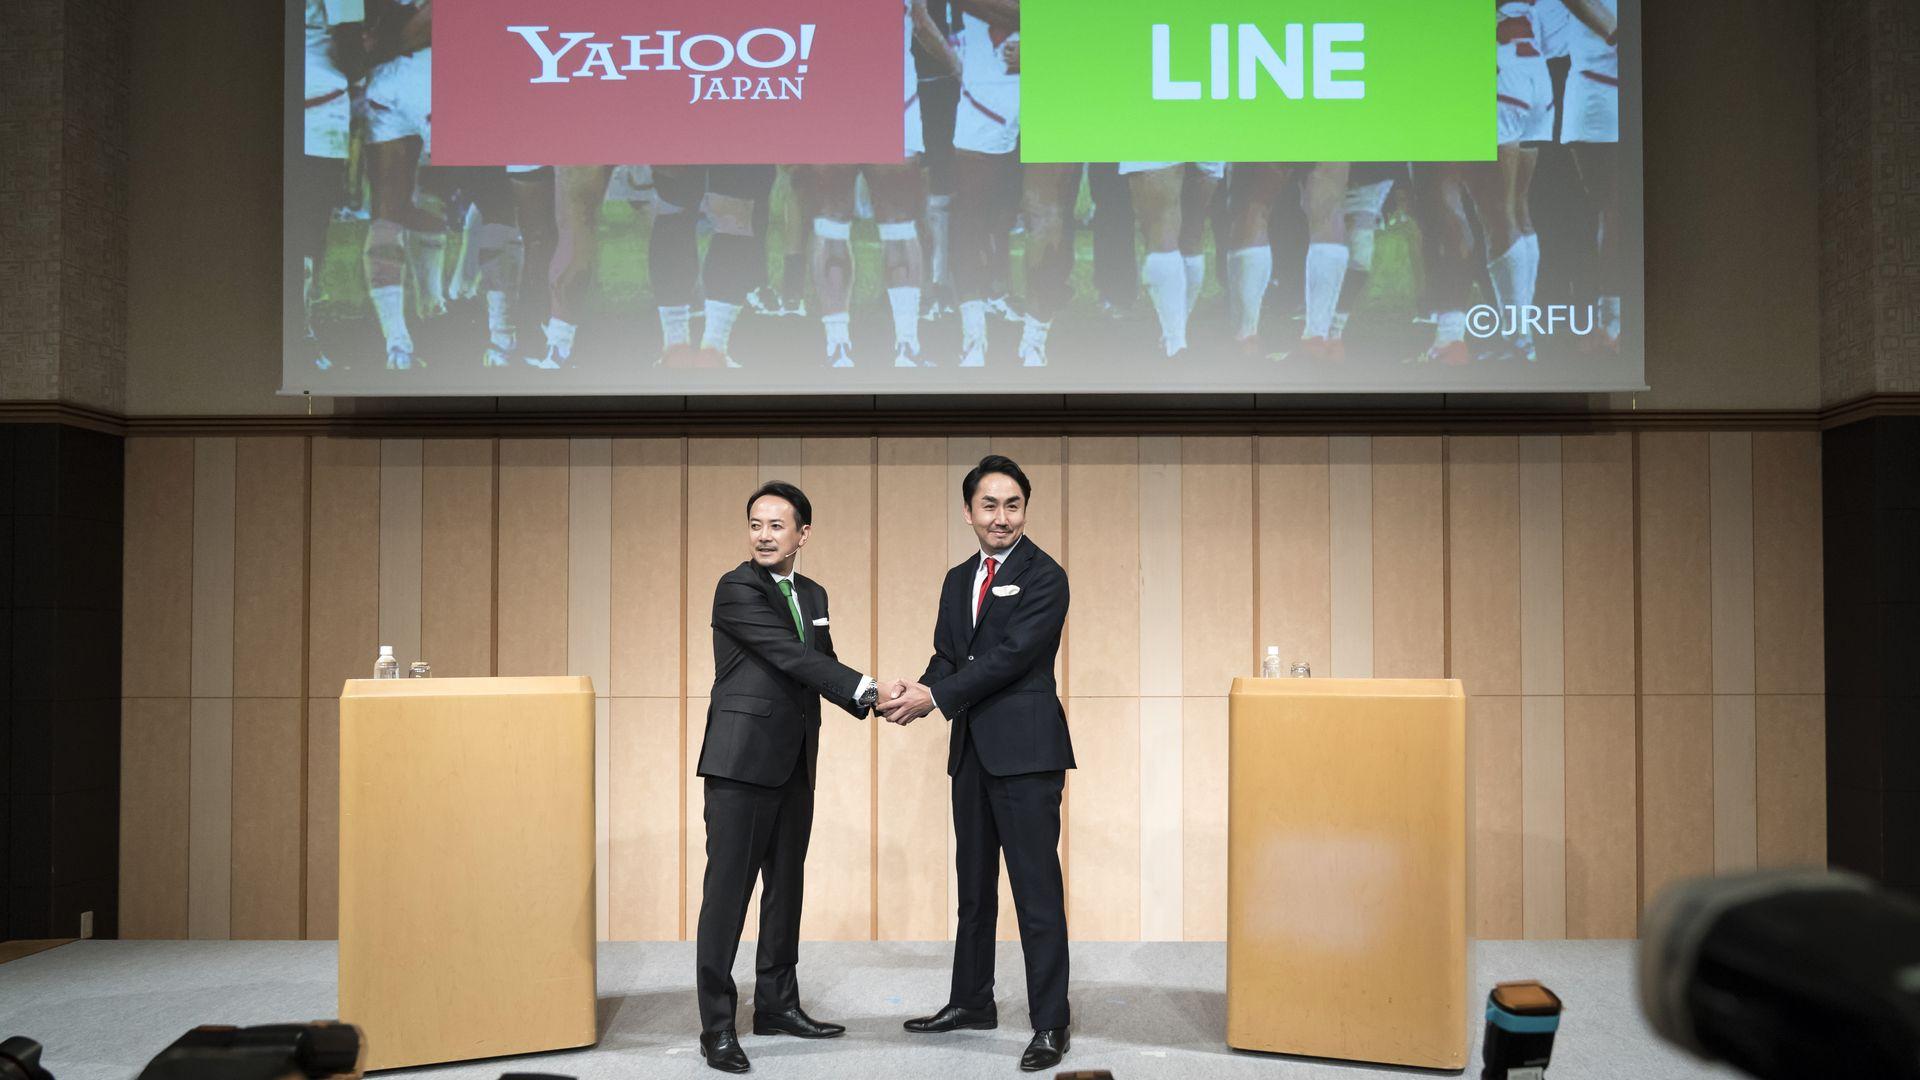 yahoo line